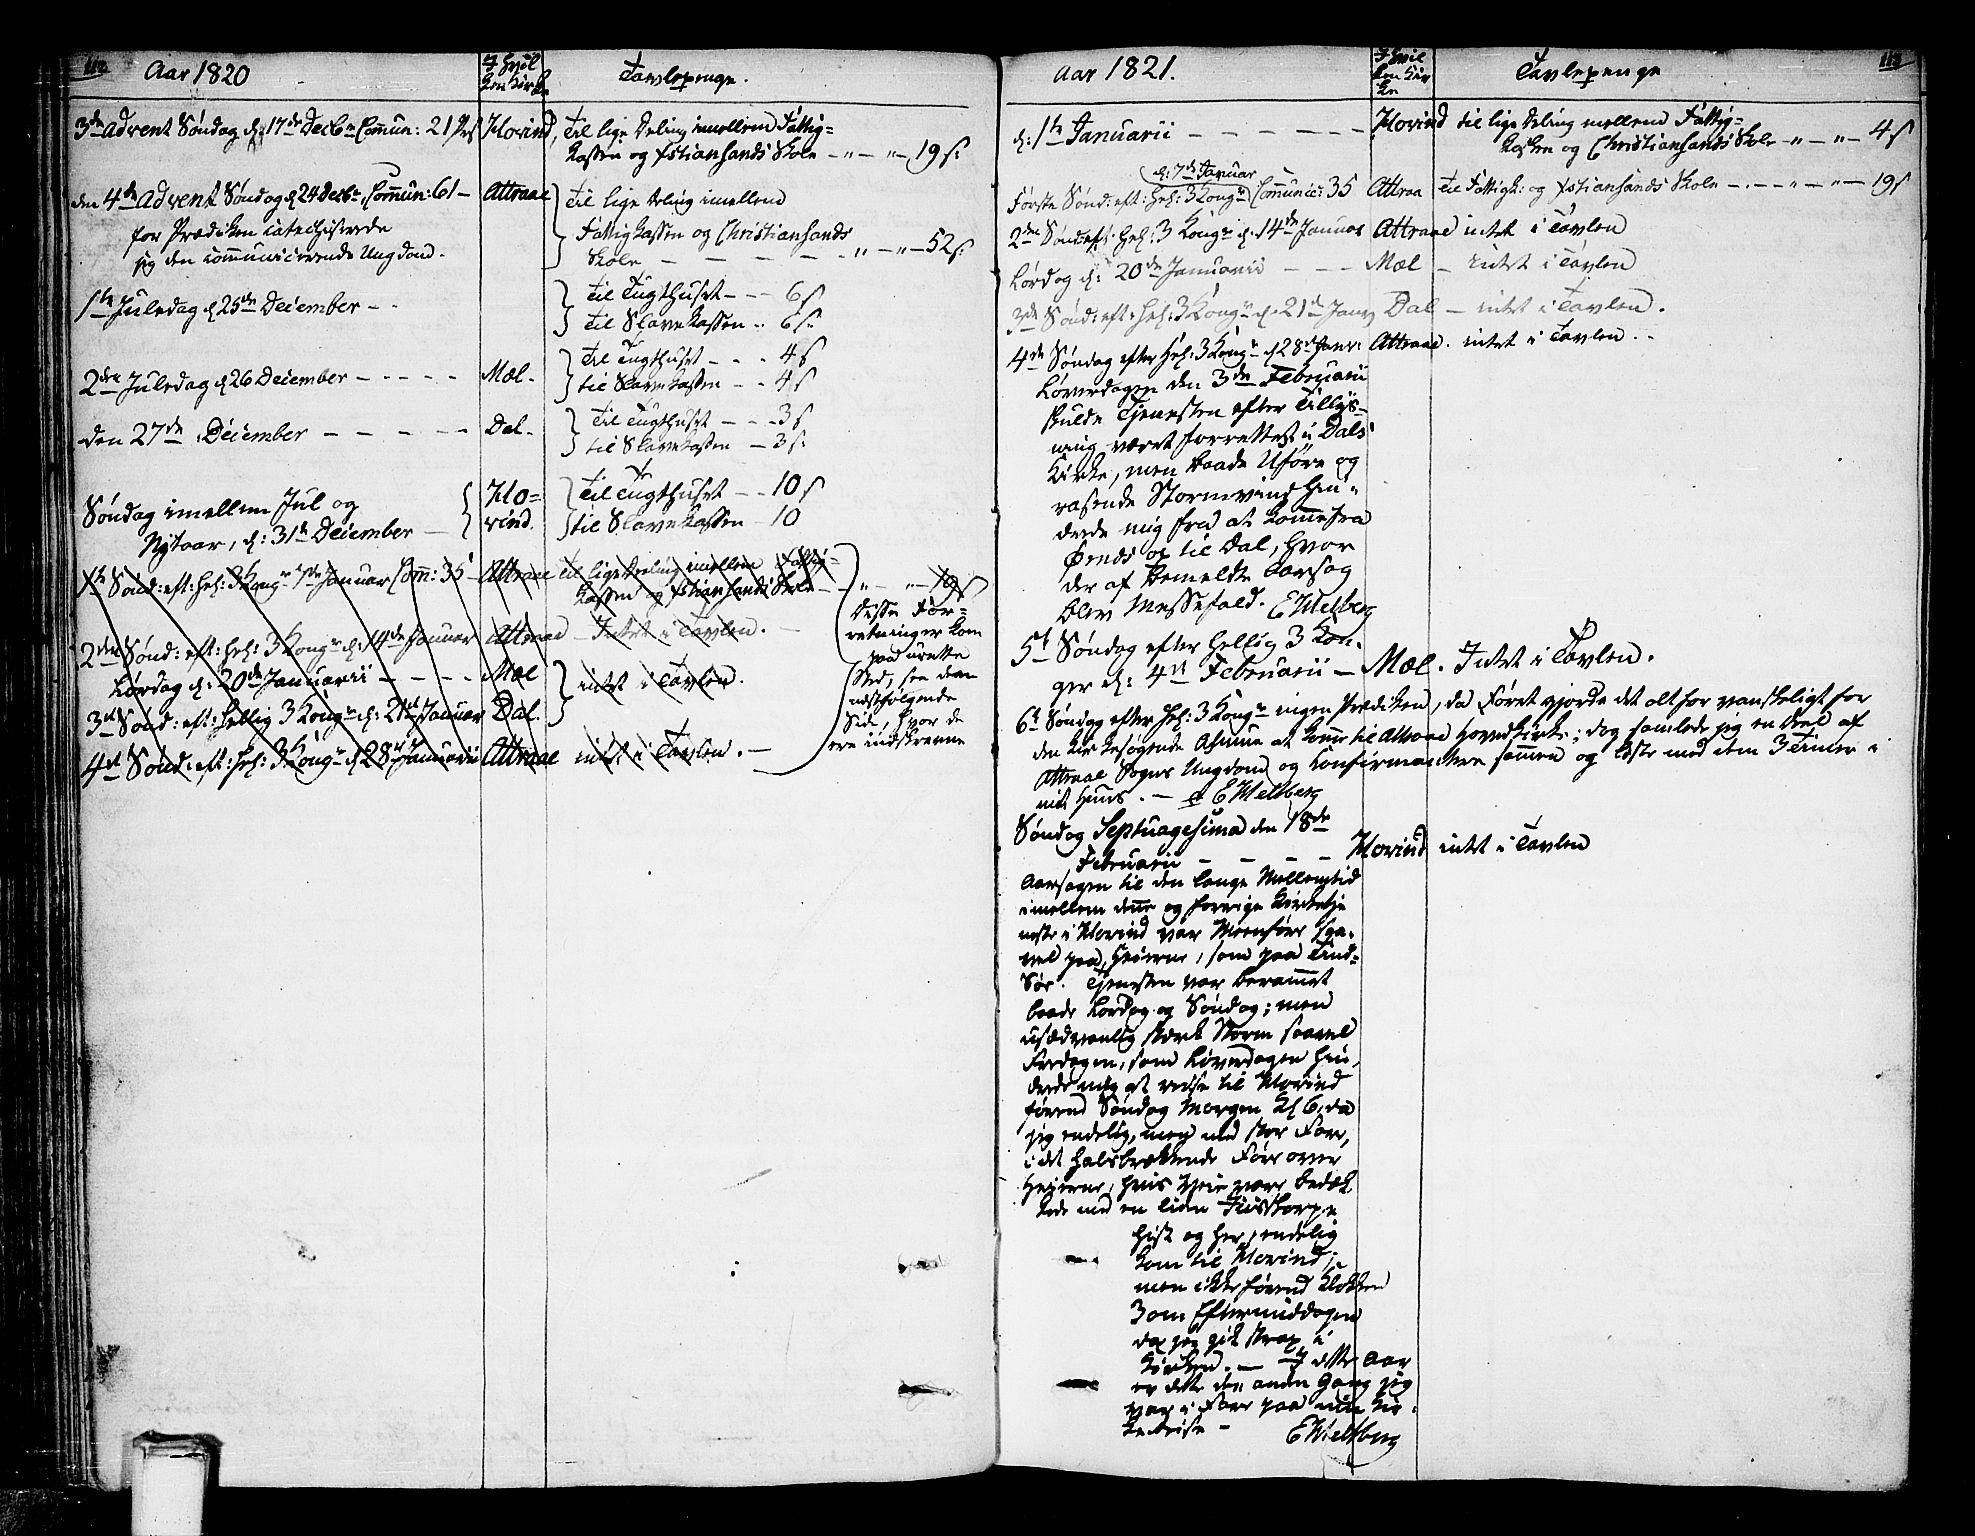 SAKO, Tinn kirkebøker, F/Fa/L0003: Ministerialbok nr. I 3, 1810-1814, s. 112-113